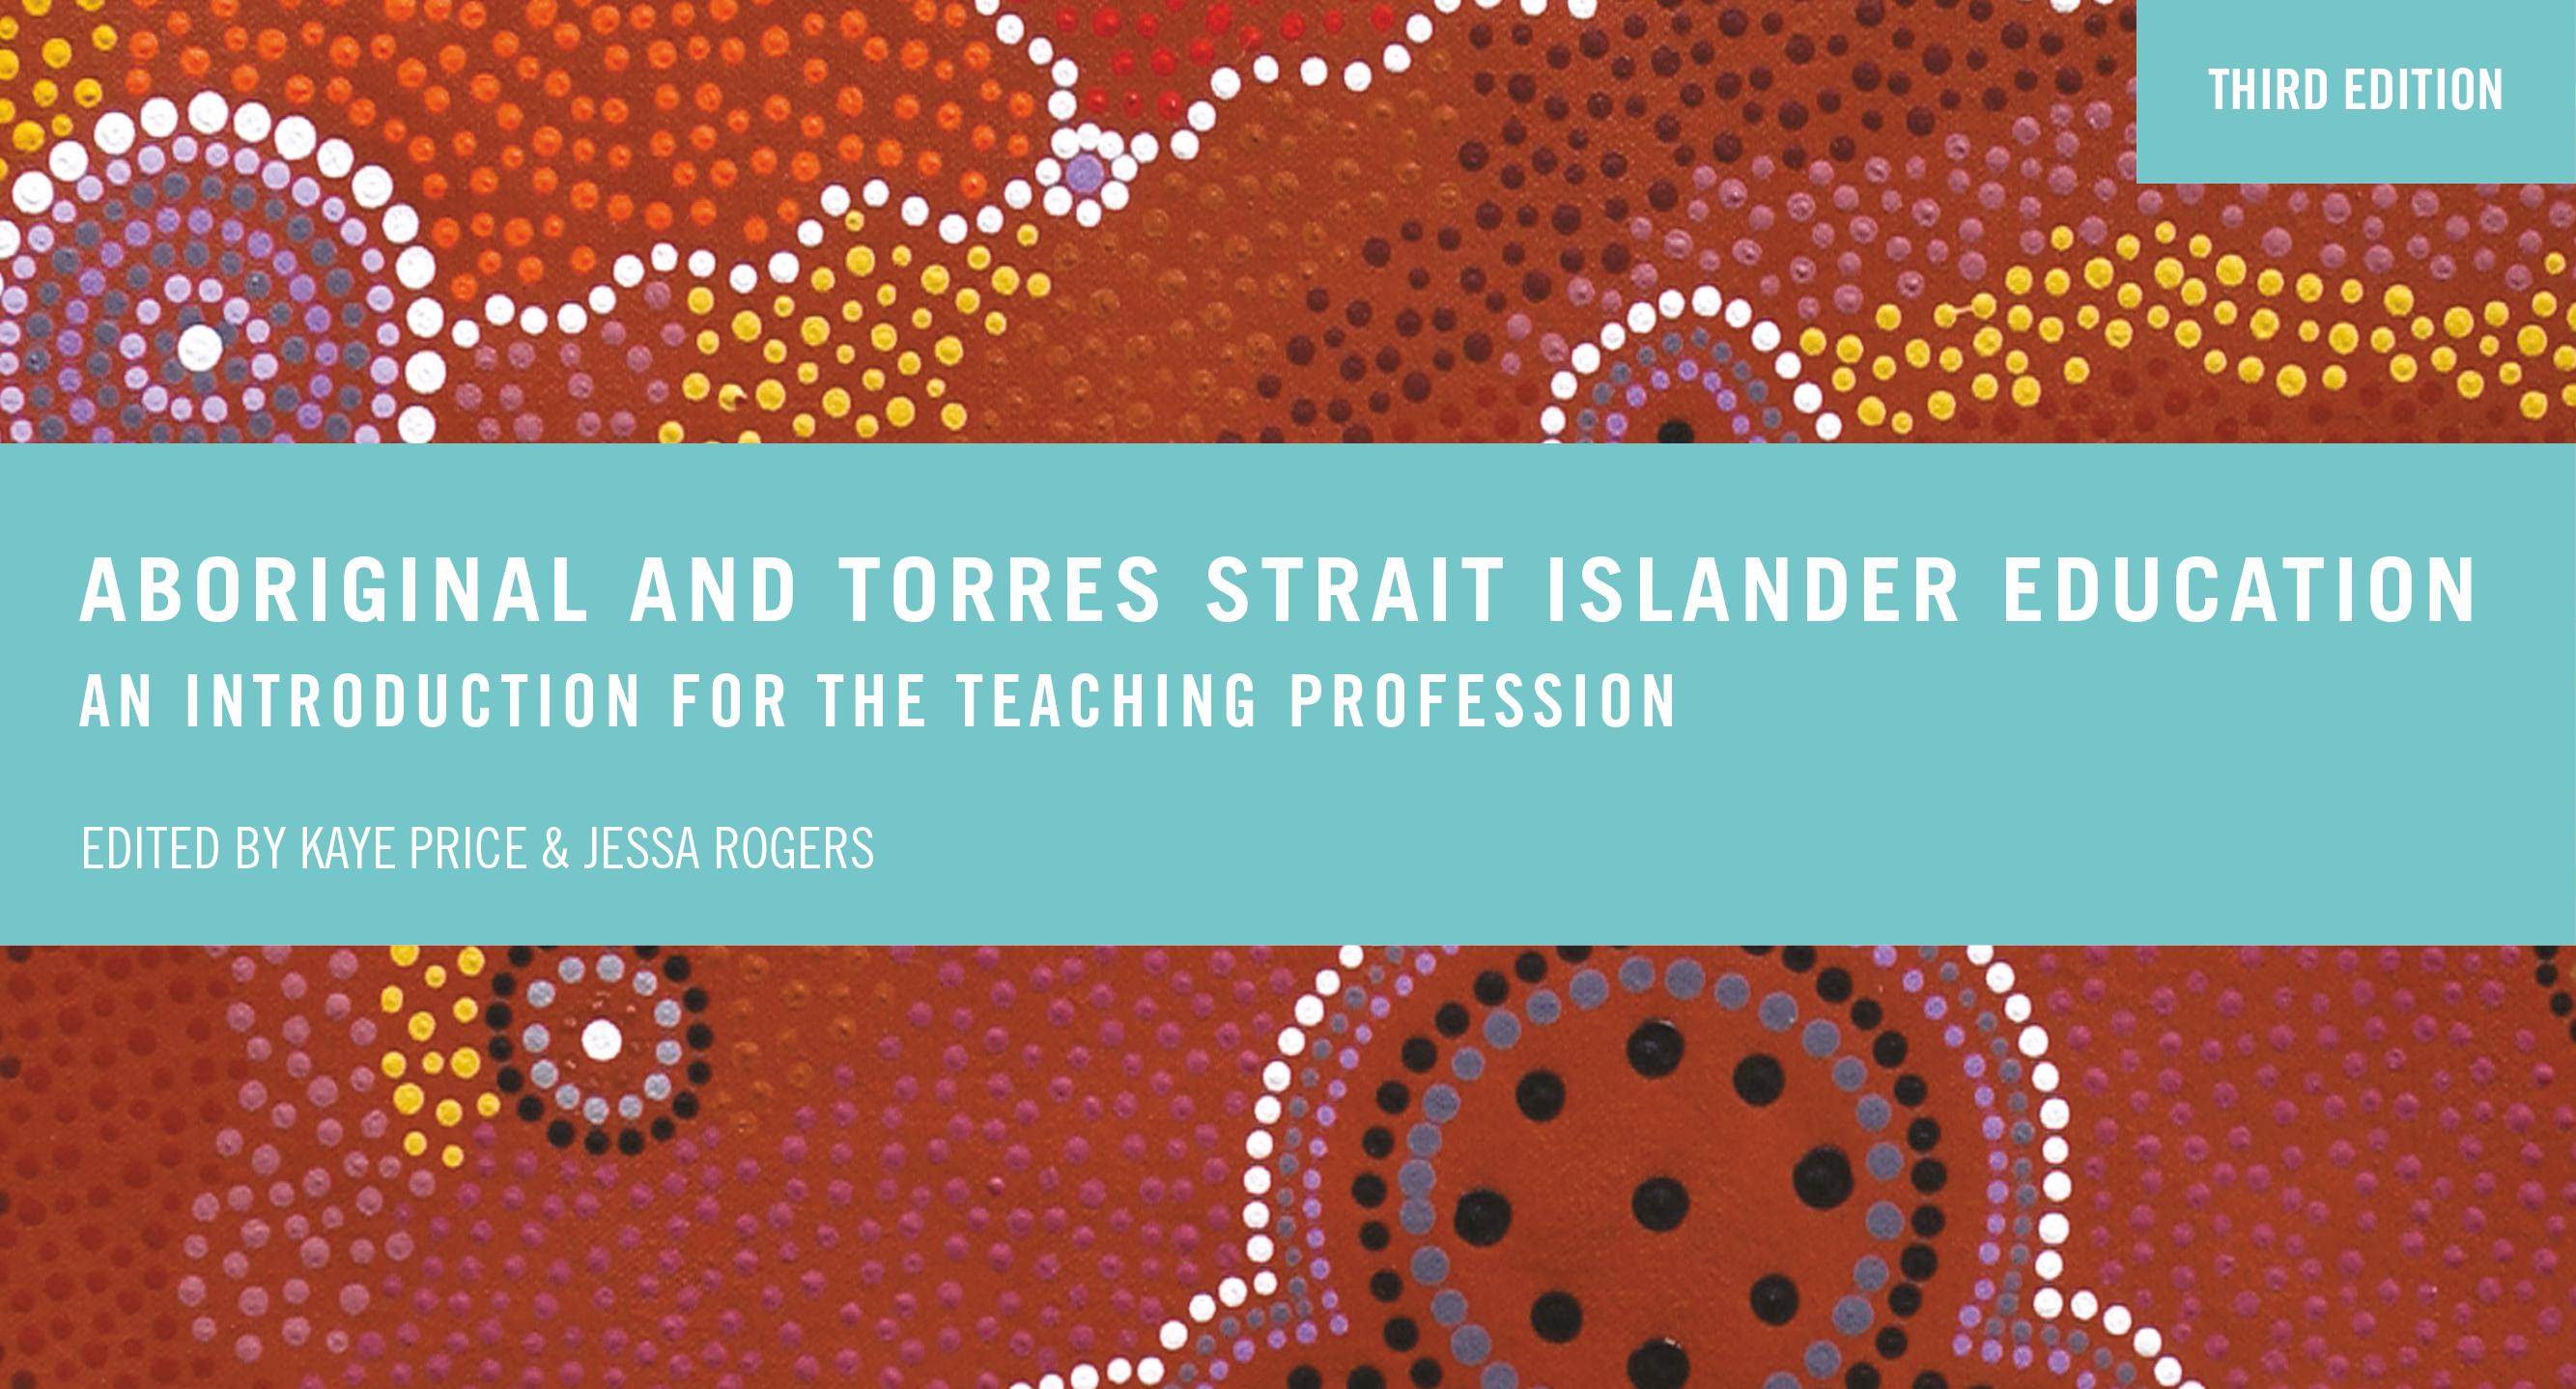 Aboriginal and Torres Strait Islander Education, 3ed